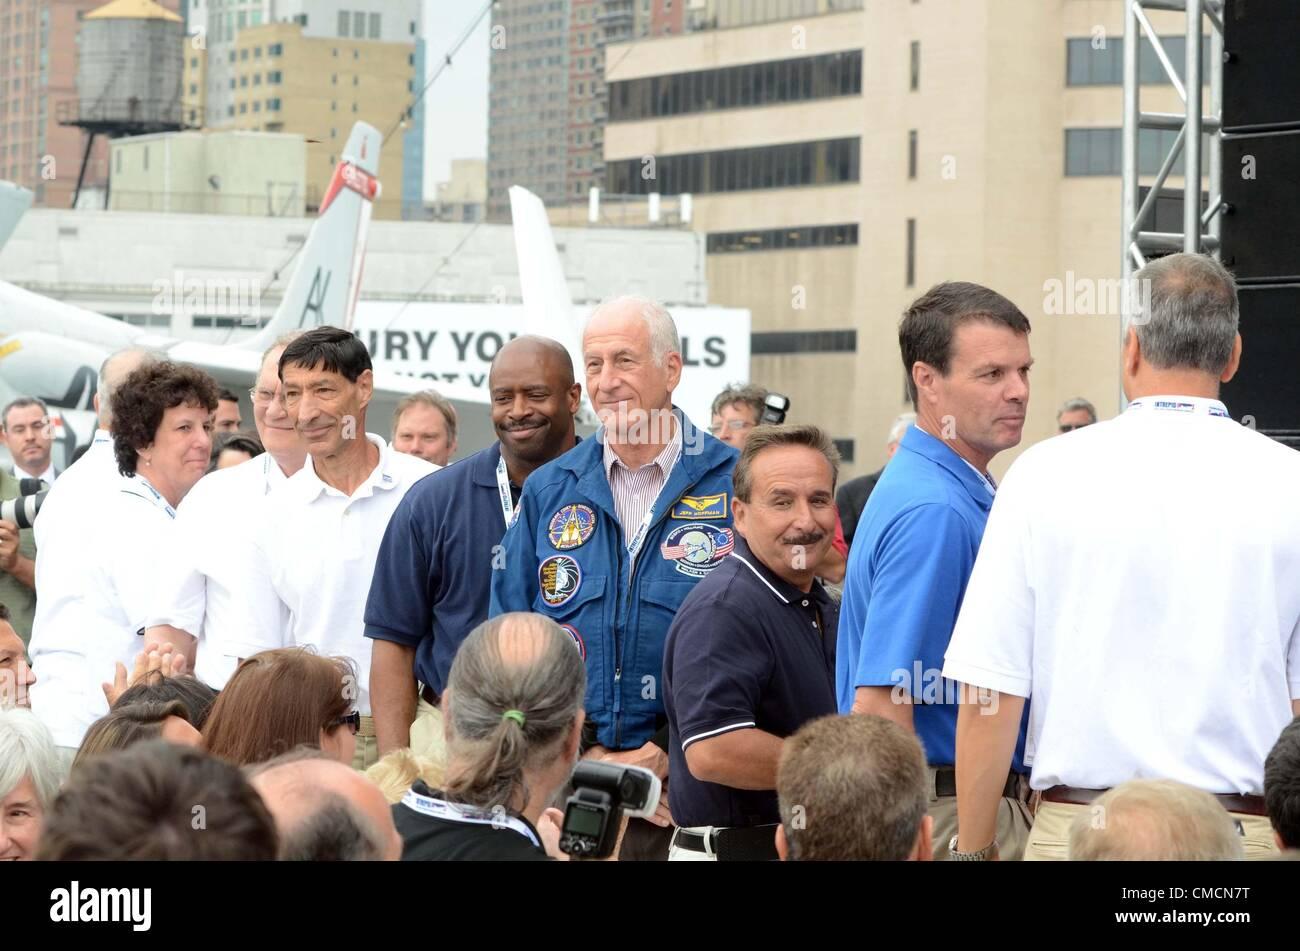 Thursday 19th July 2012. New York, USA. Lee Morin, Ellen Baker, Karol Bo Bobko, Mario Runco, Leland Melvin, Jeffrey - Stock Image